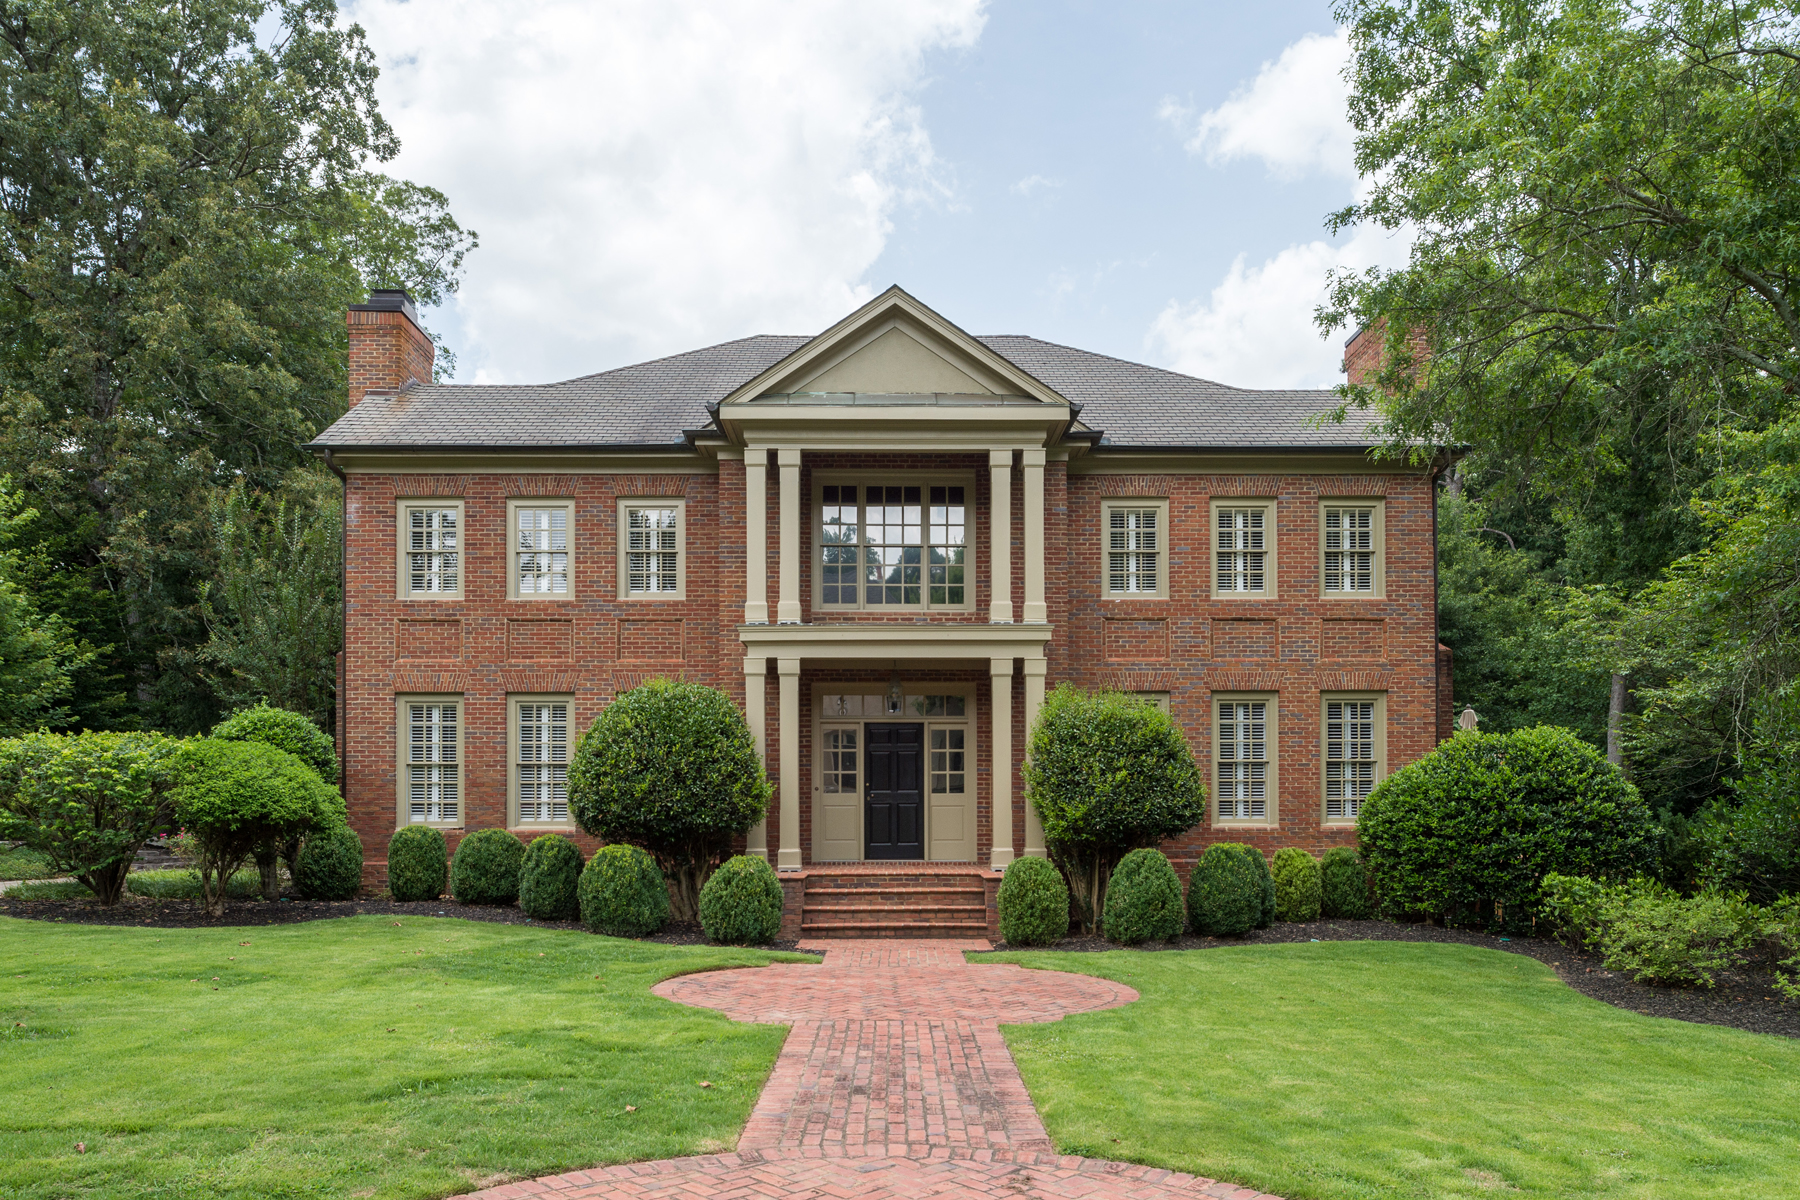 Single Family Home for Rent at Georgian Brick With Pool 1520 Stonegate Way Atlanta, Georgia 30327 United States